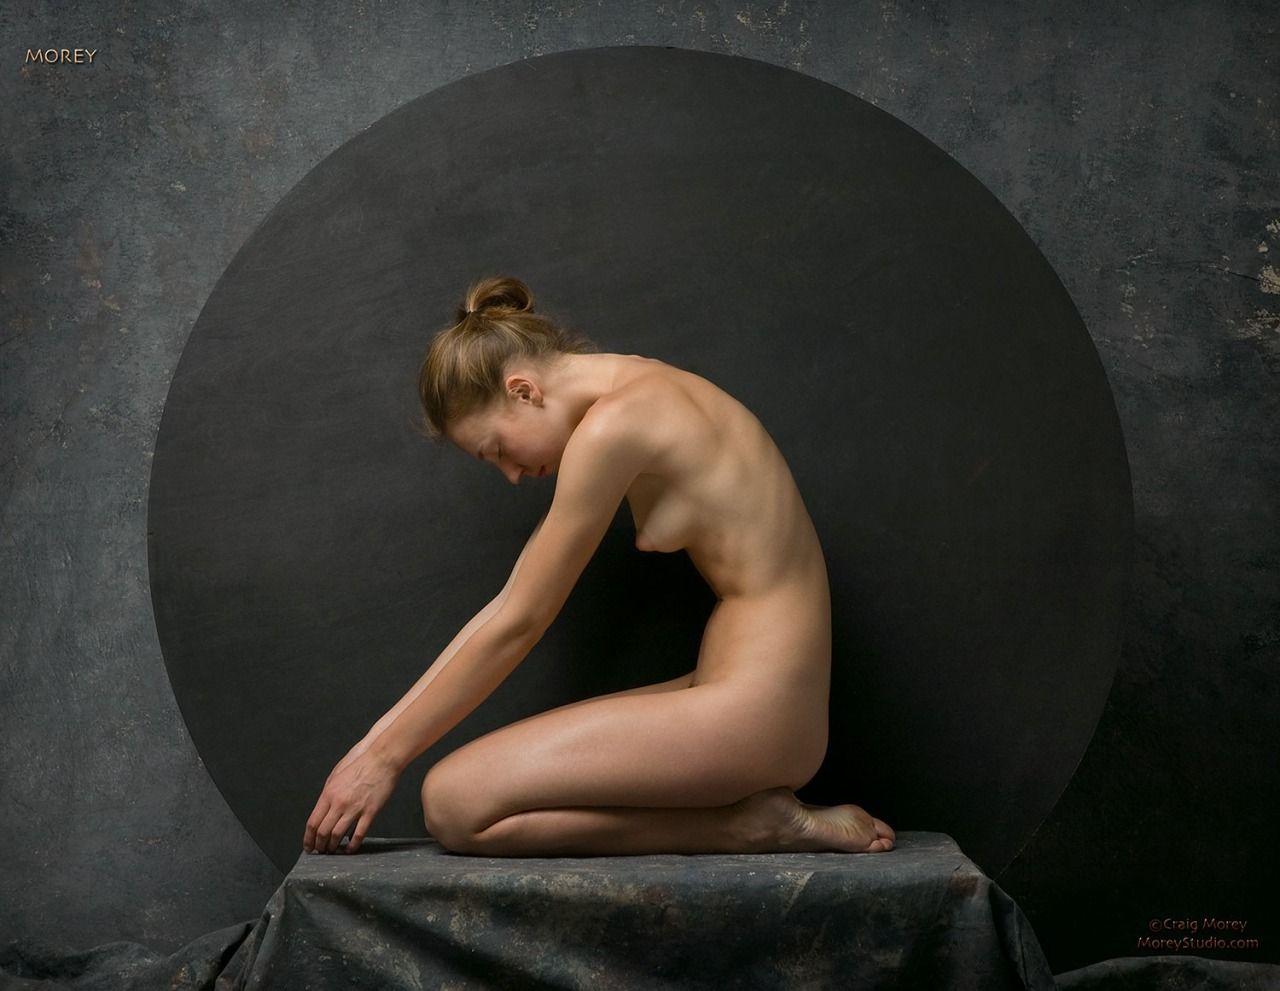 Craig Morey art prints: Yelena 0041